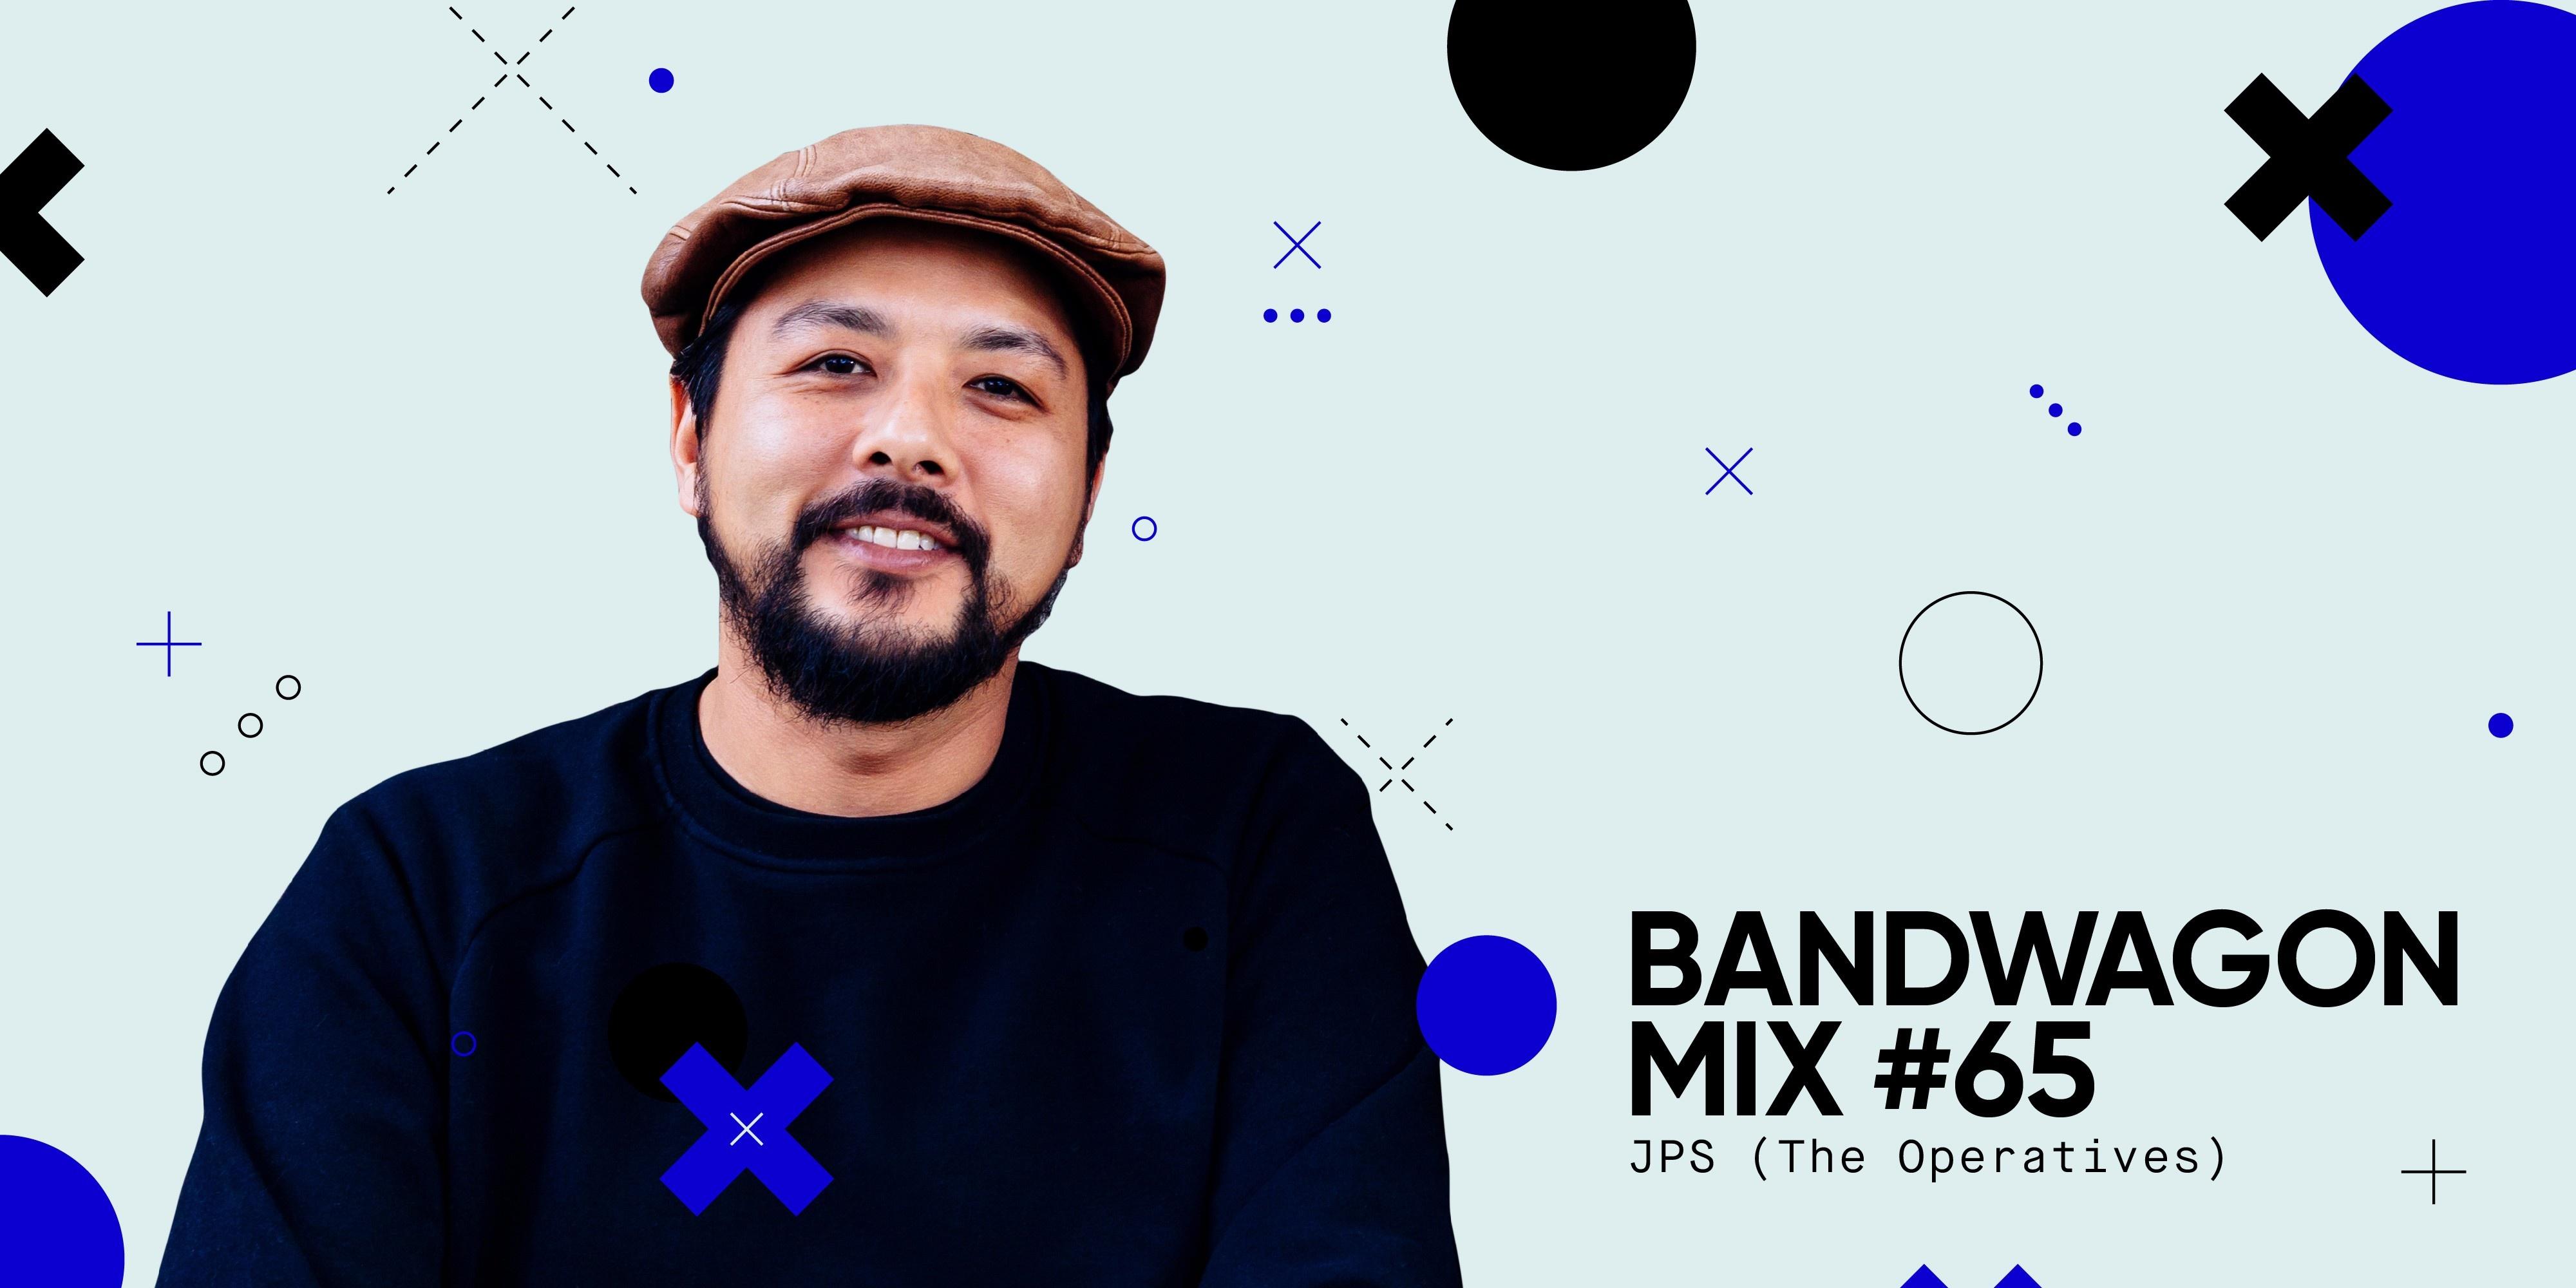 Bandwagon Mix #65: JPS (The Operatives)